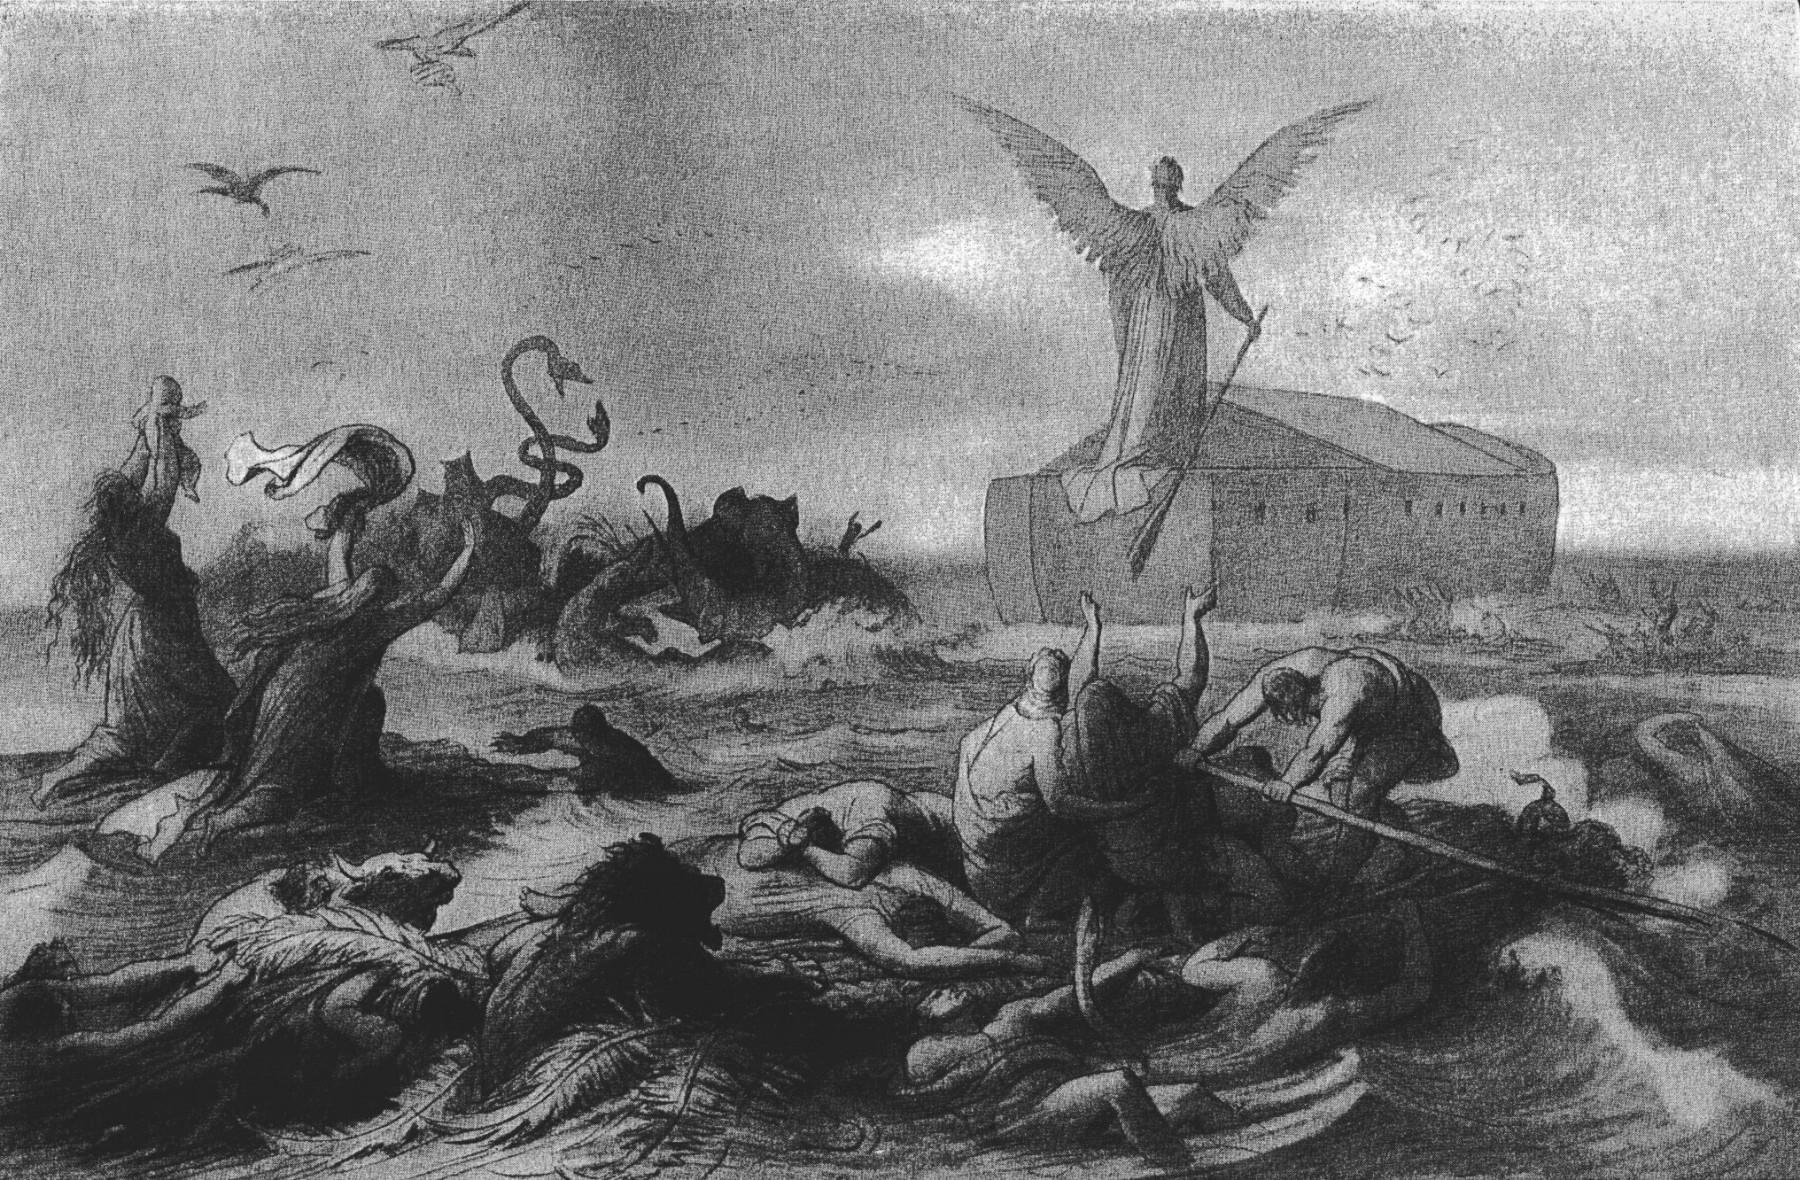 Upadłe anioły (Nephilim)